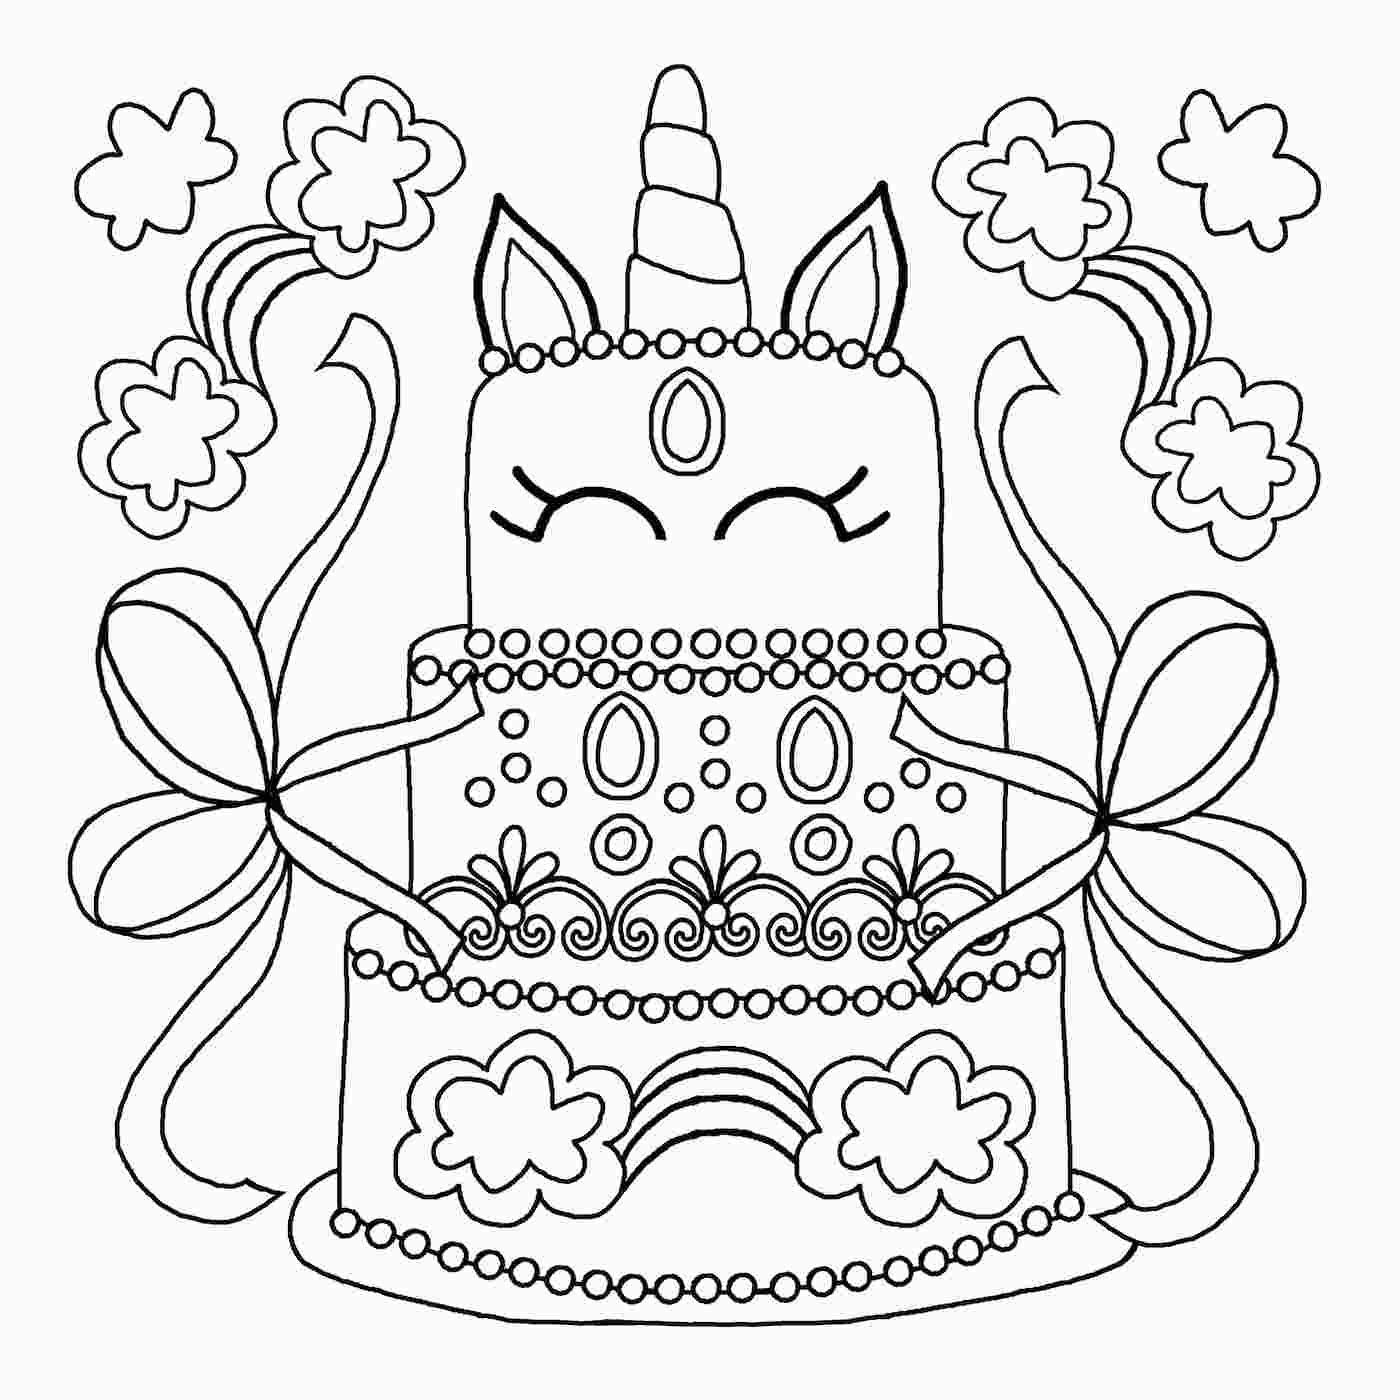 Unicorn Cake Coloring Sheet Unicorn Coloring Pages Mermaid Coloring Pages Christmas Coloring Pages